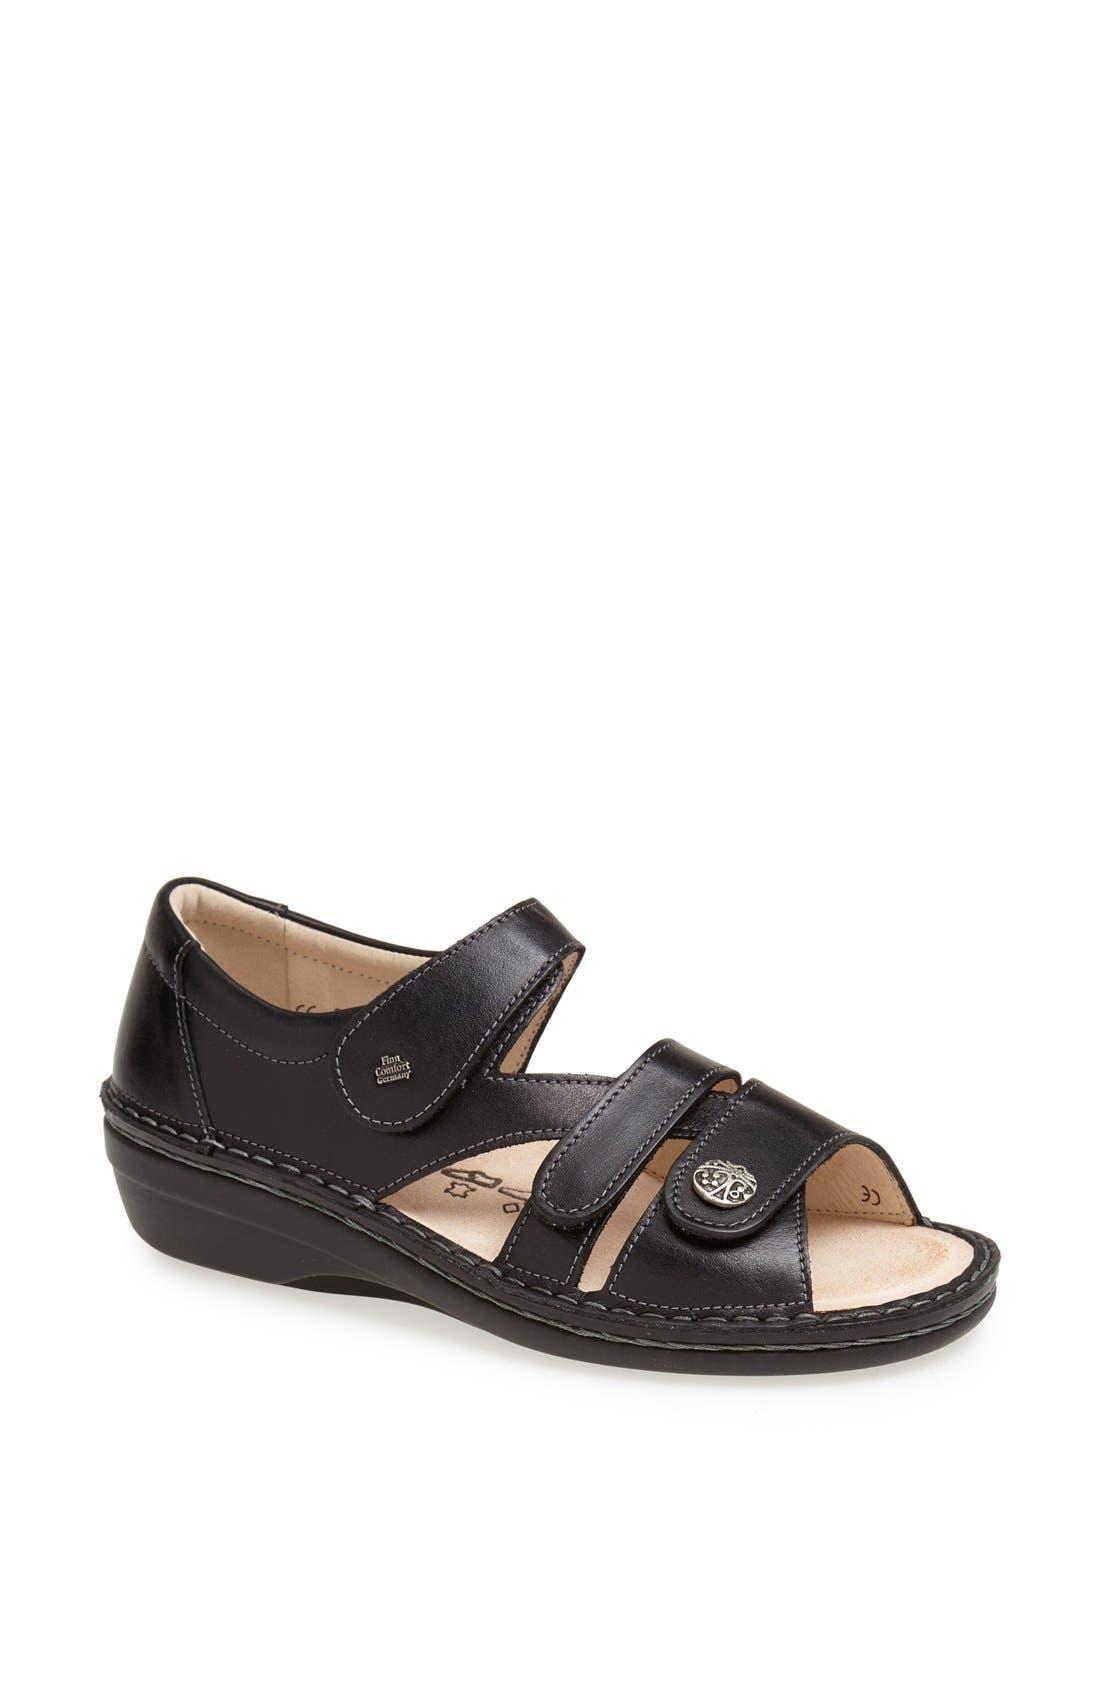 Main Image - Finn Comfort 'Sintra' Sandal